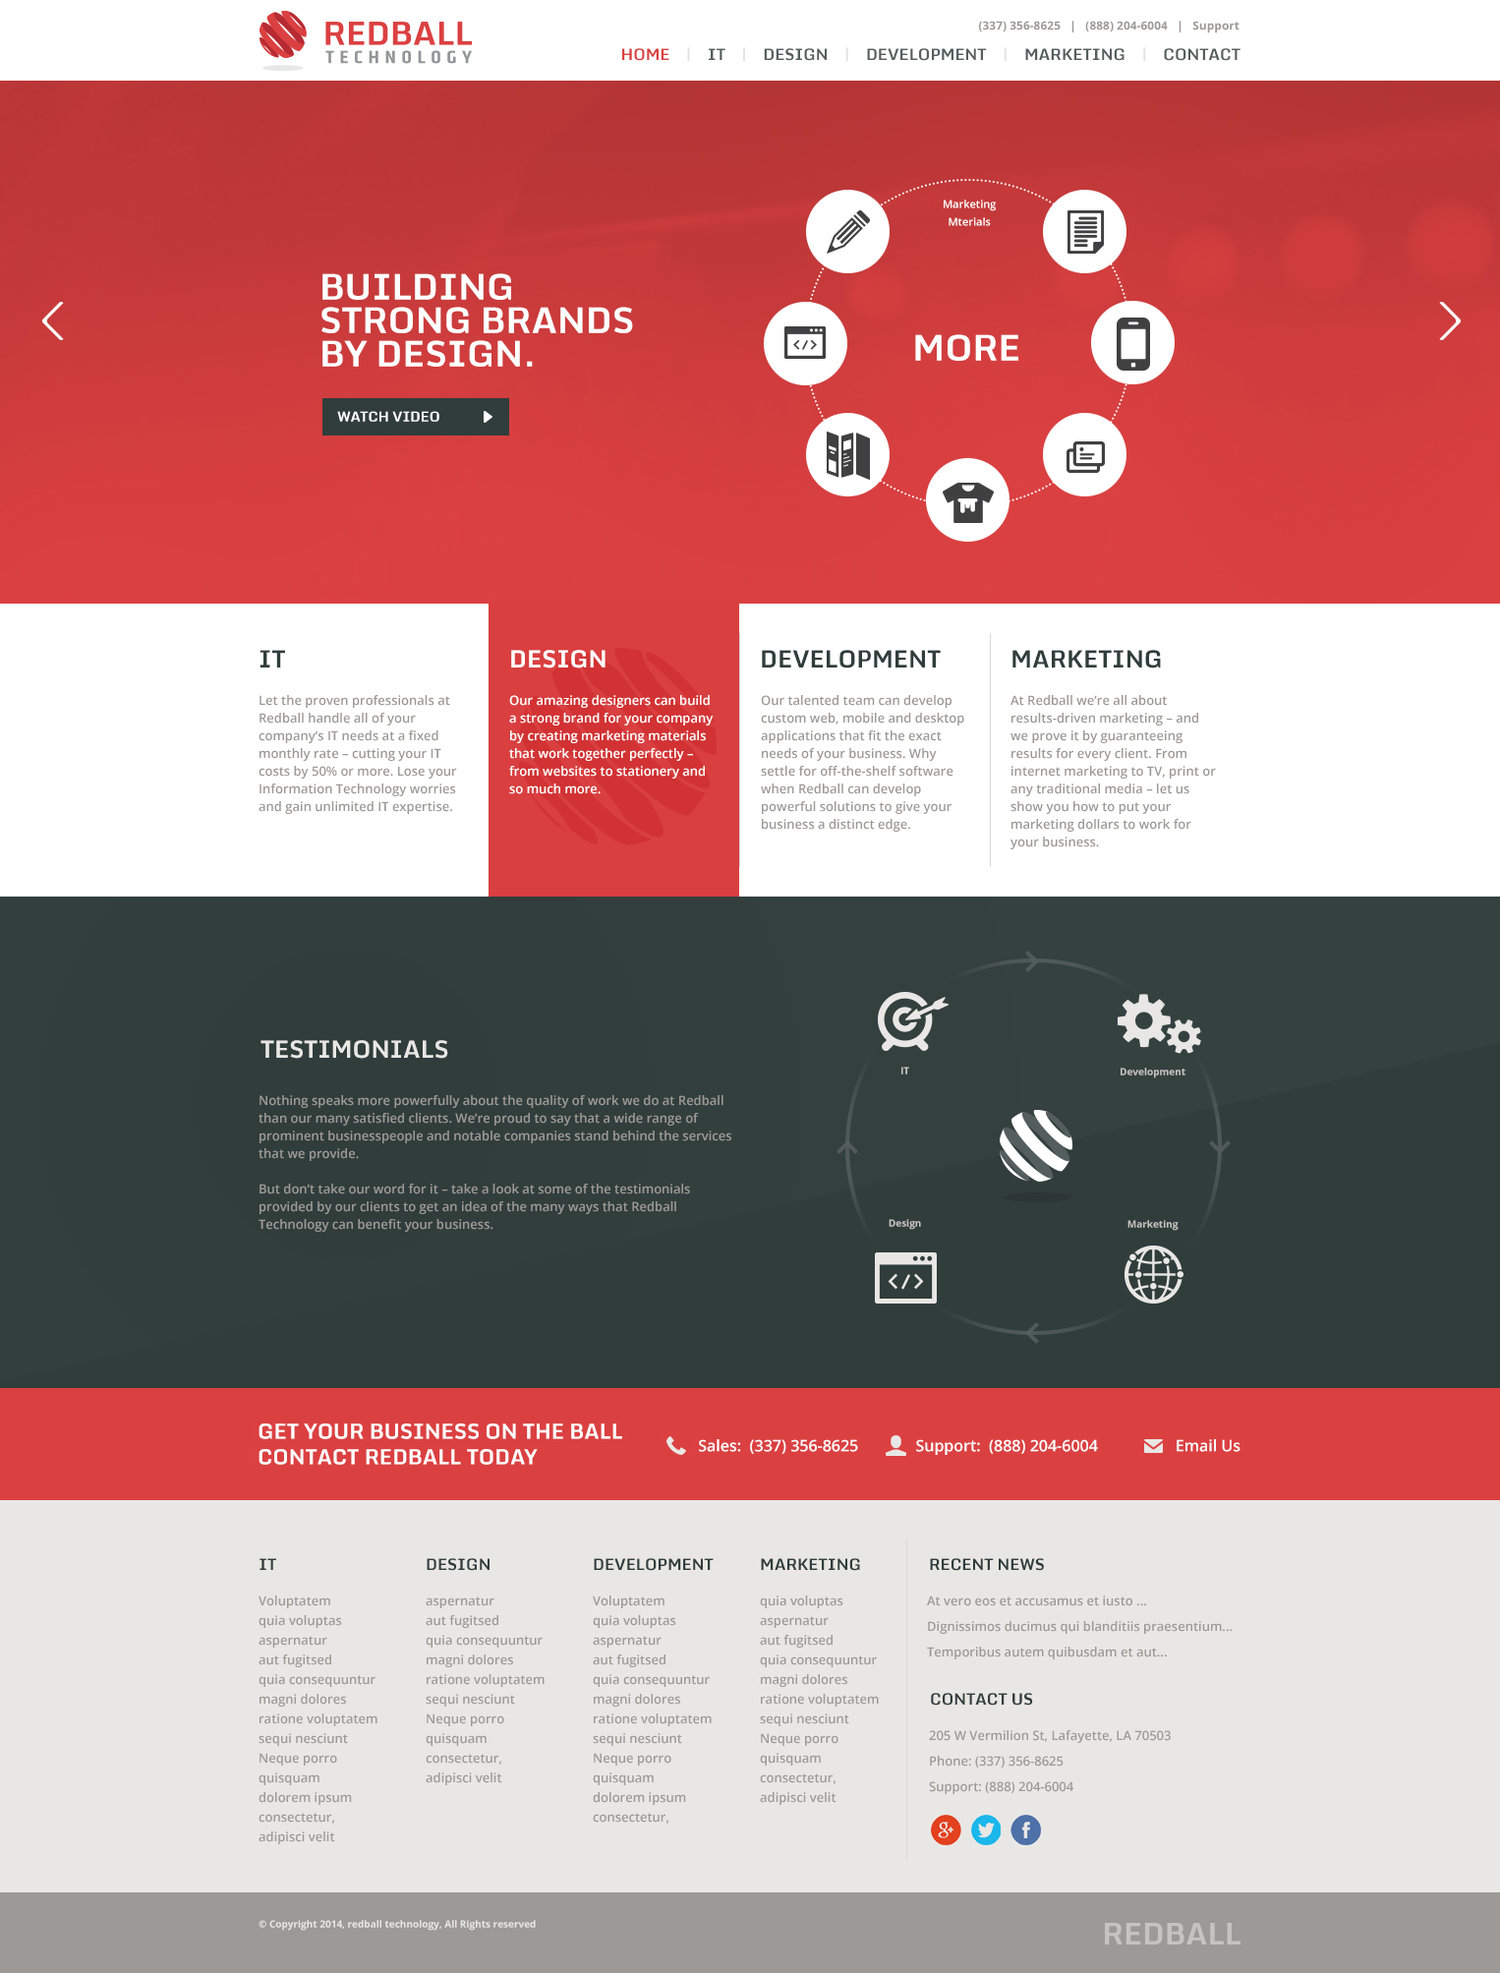 Redball Technology Home Page Design Matthew Wiltz